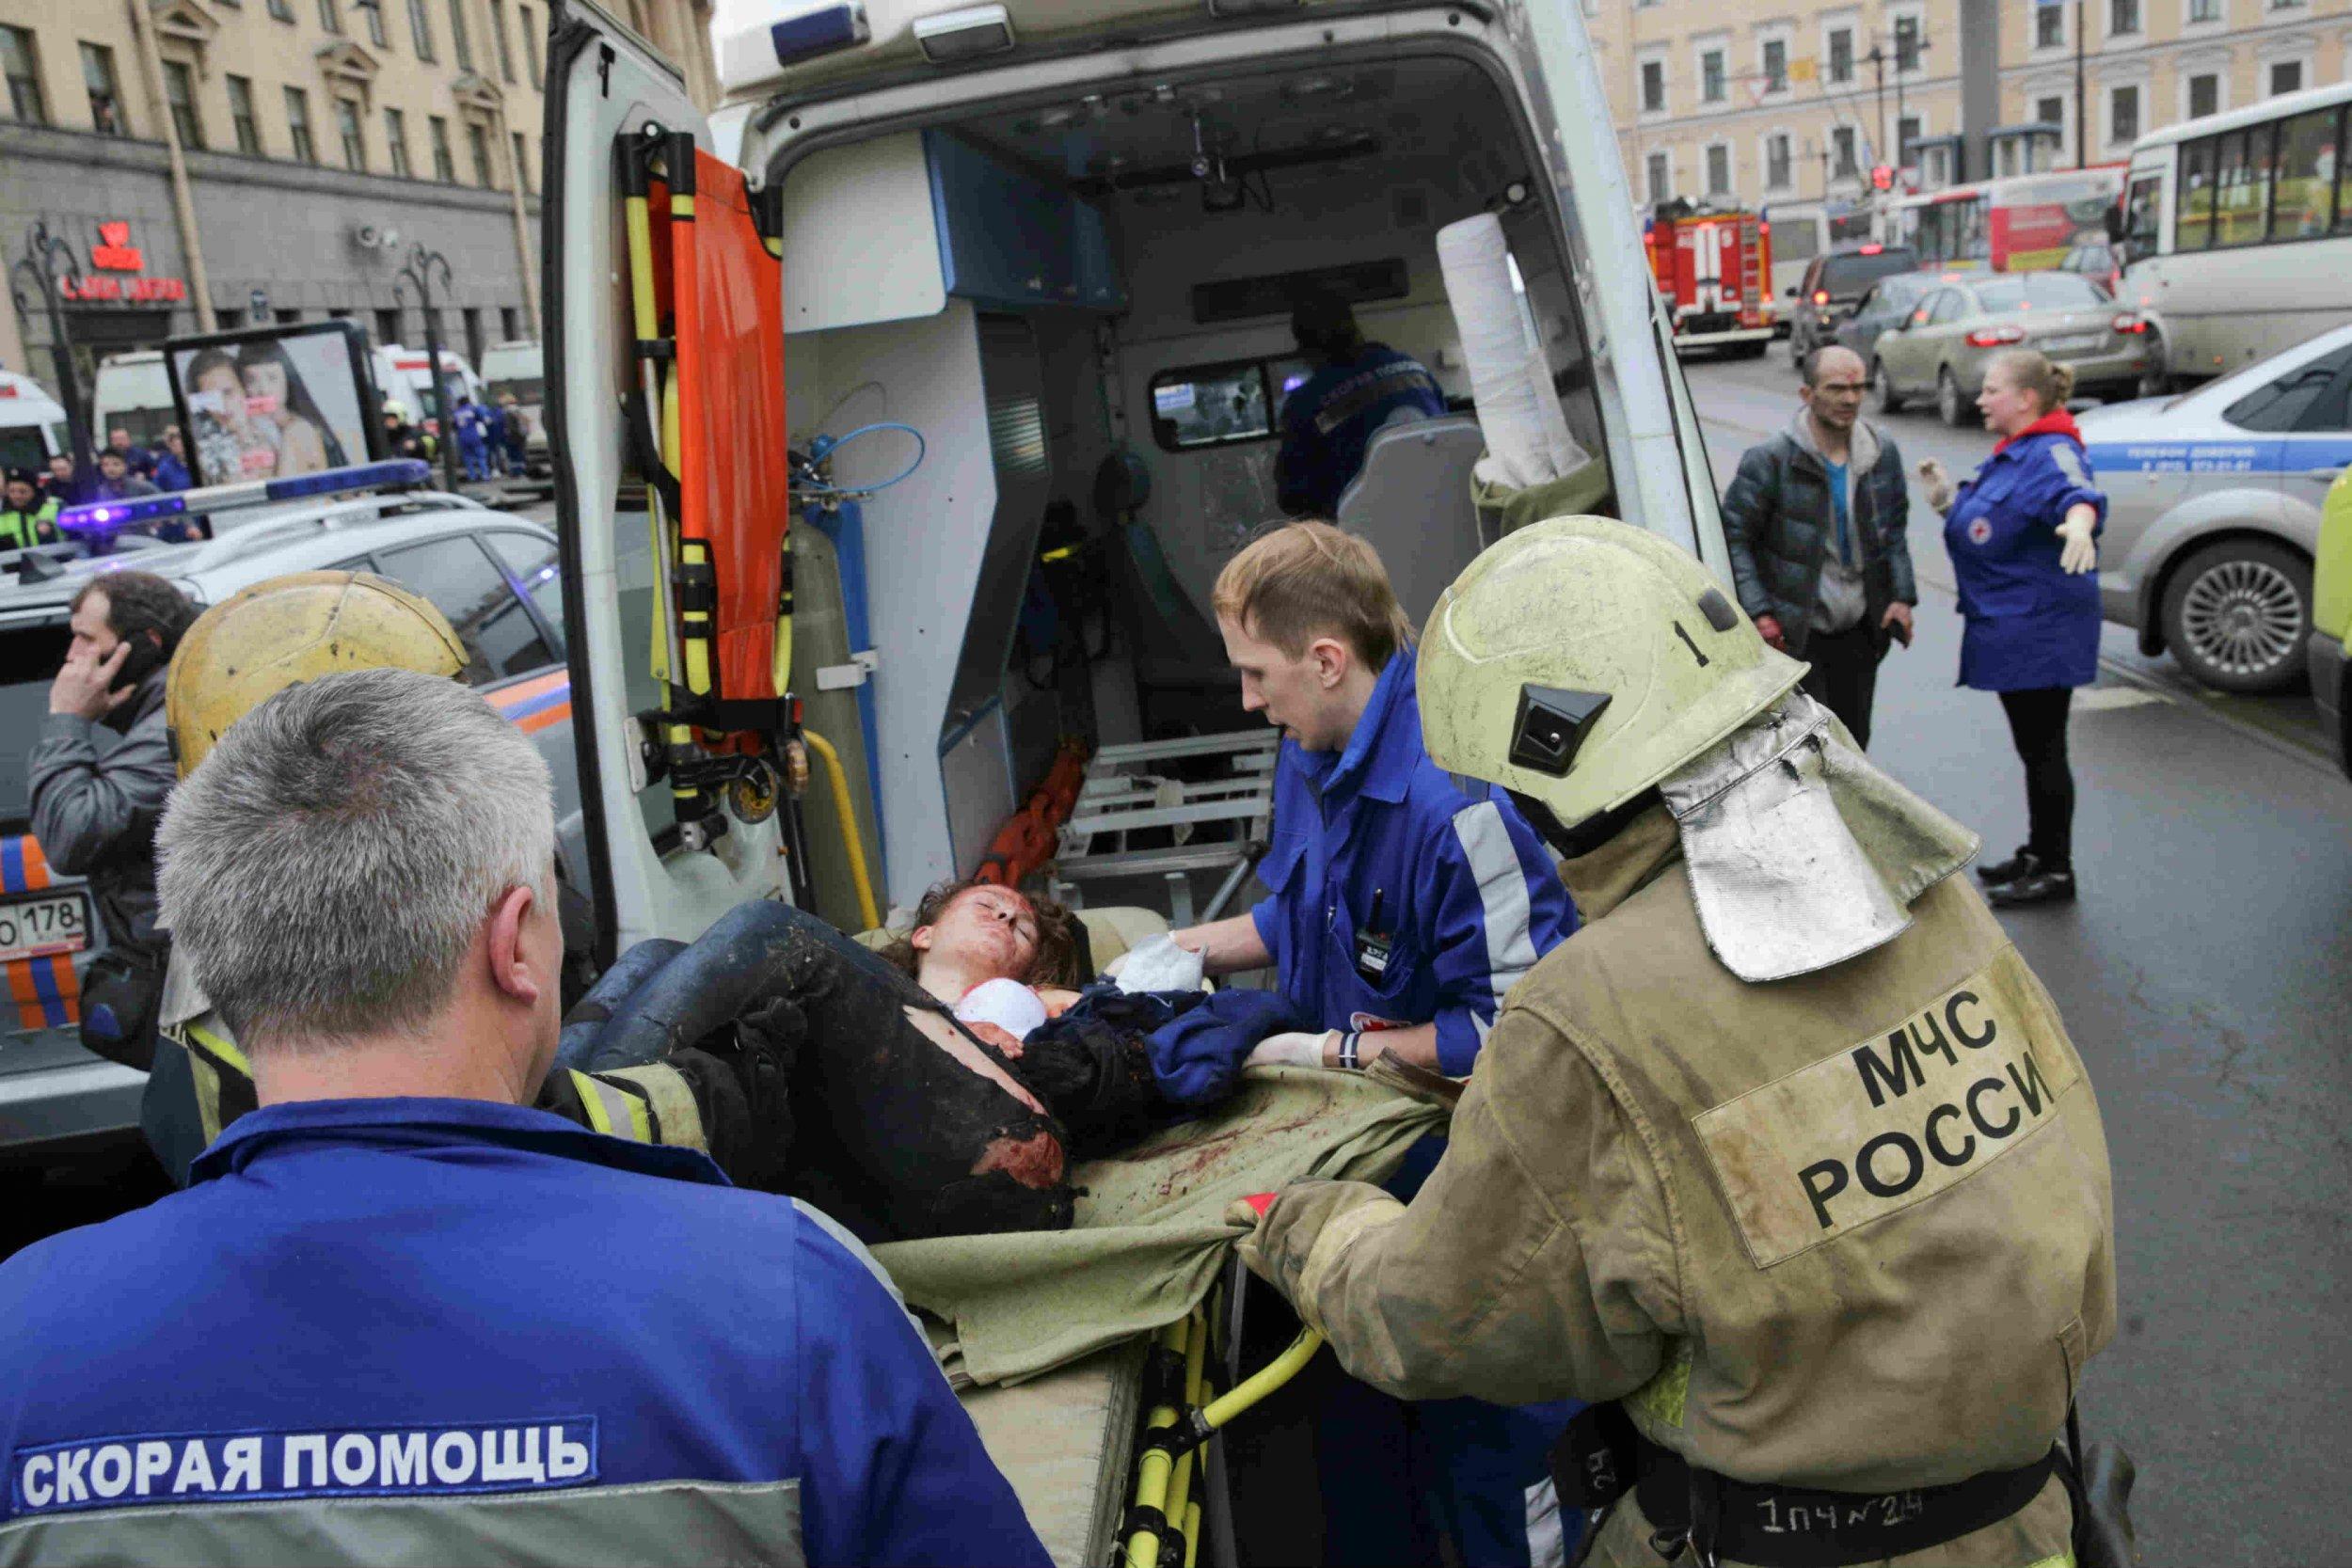 St Petersburg attack